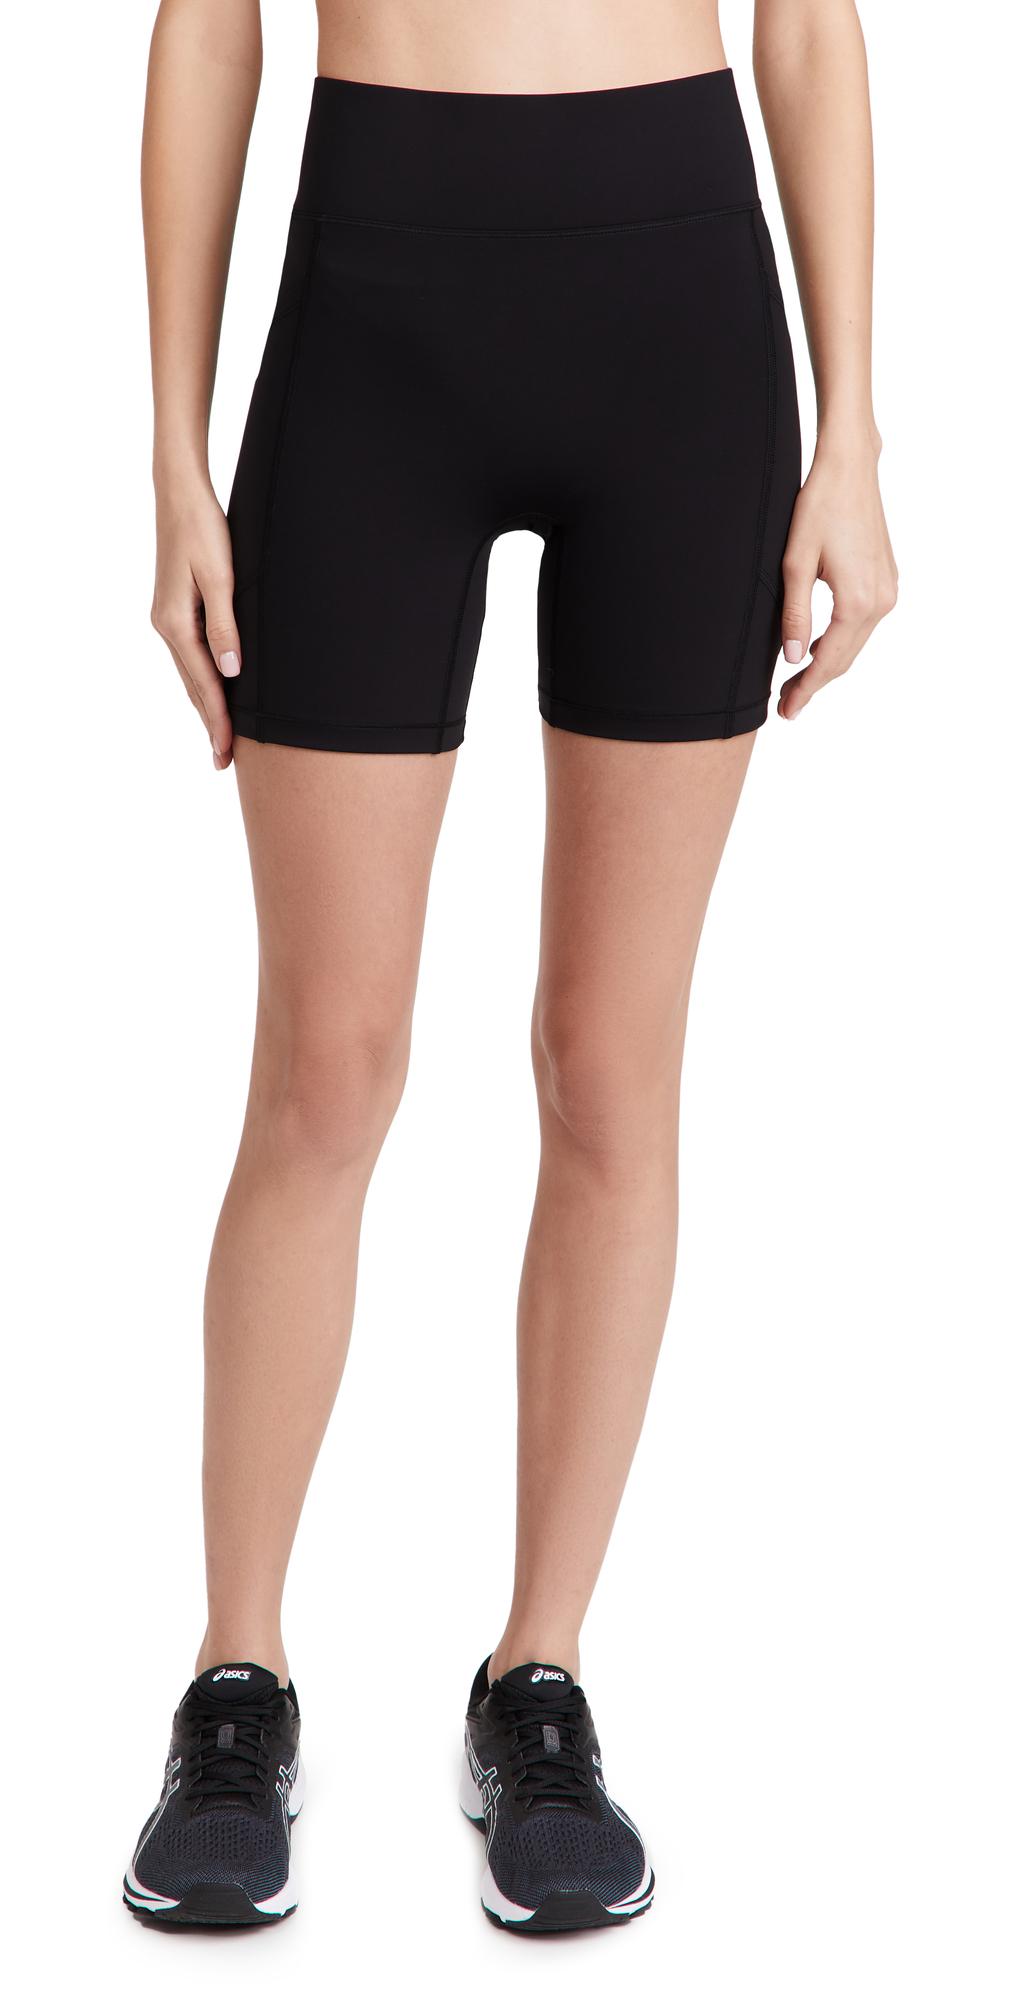 Center Stage 6 Inch Bike Shorts